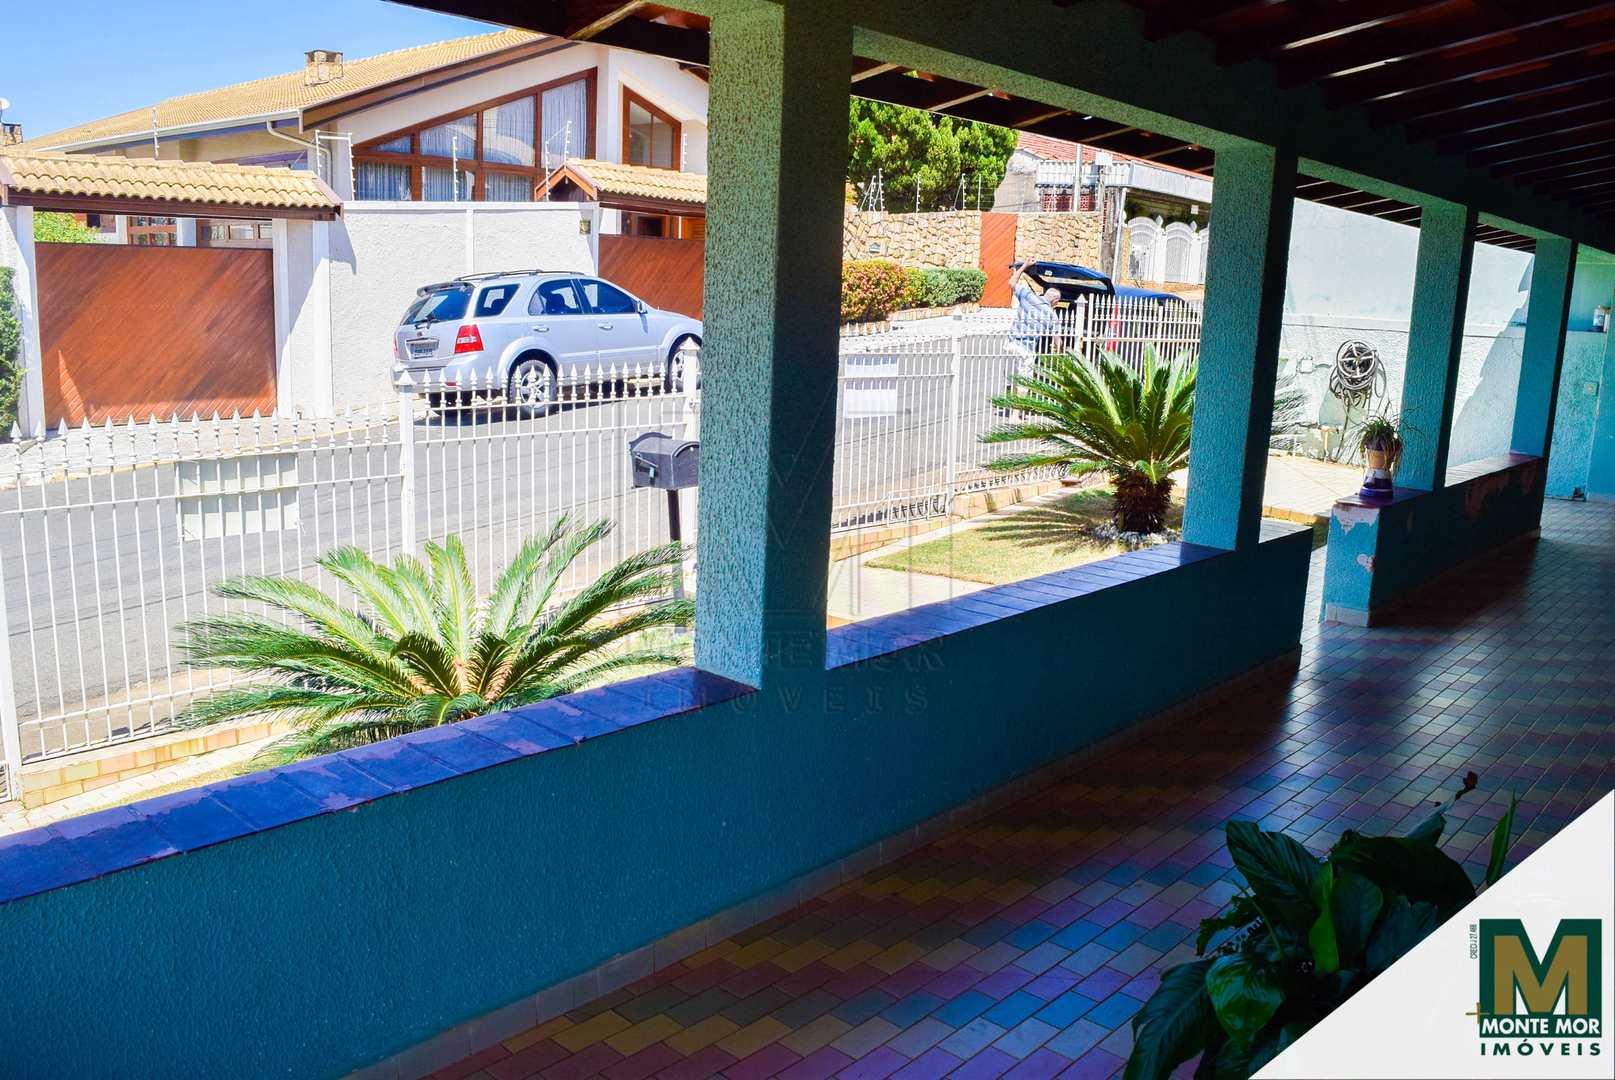 Casa - Venda - Centro - Monte Mor - SP